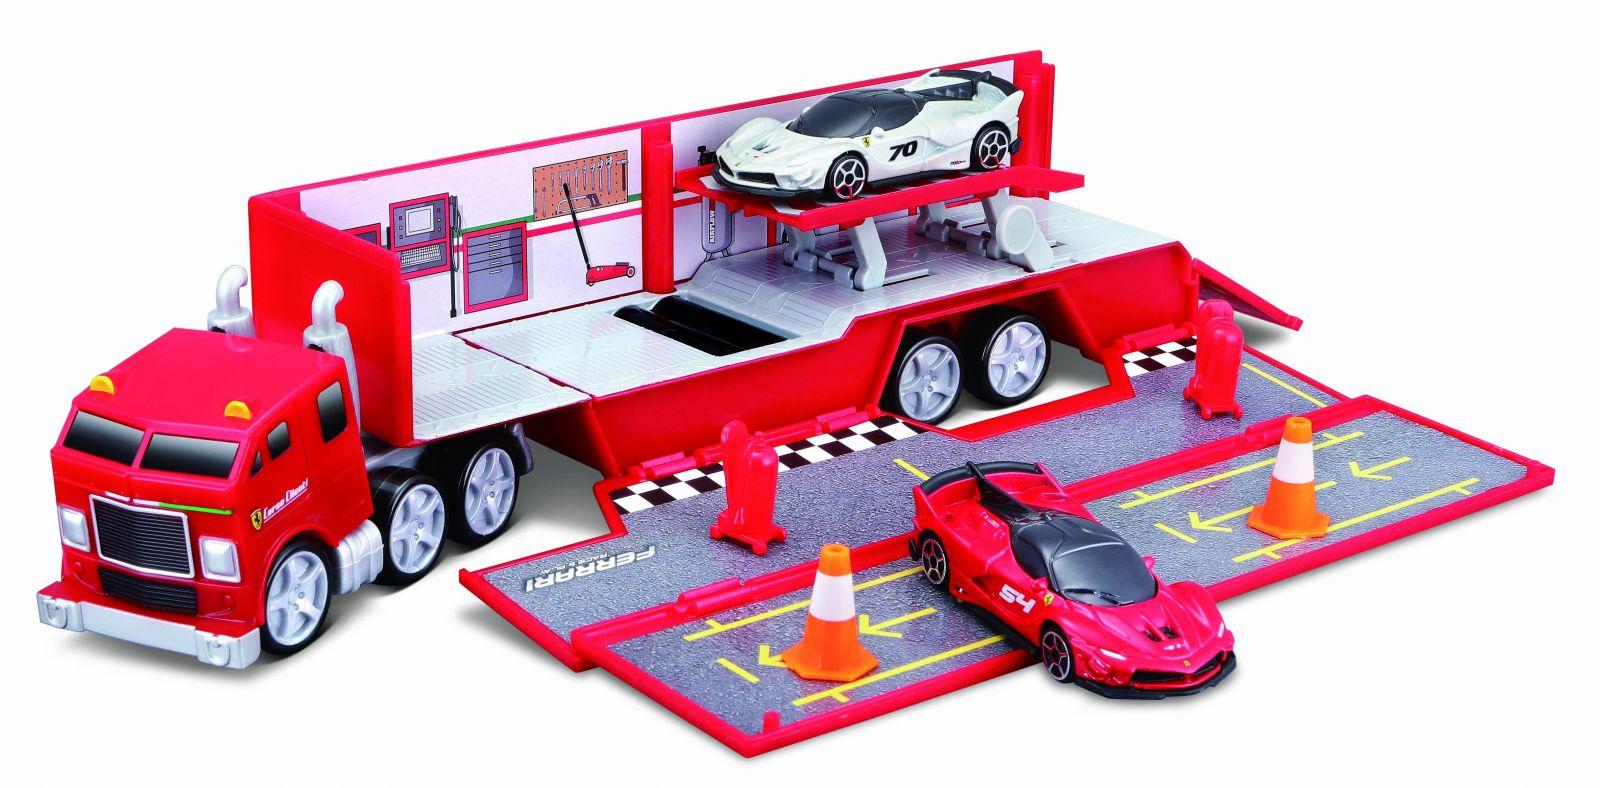 Maisto - Ferrari kamión s rampou a autíčky